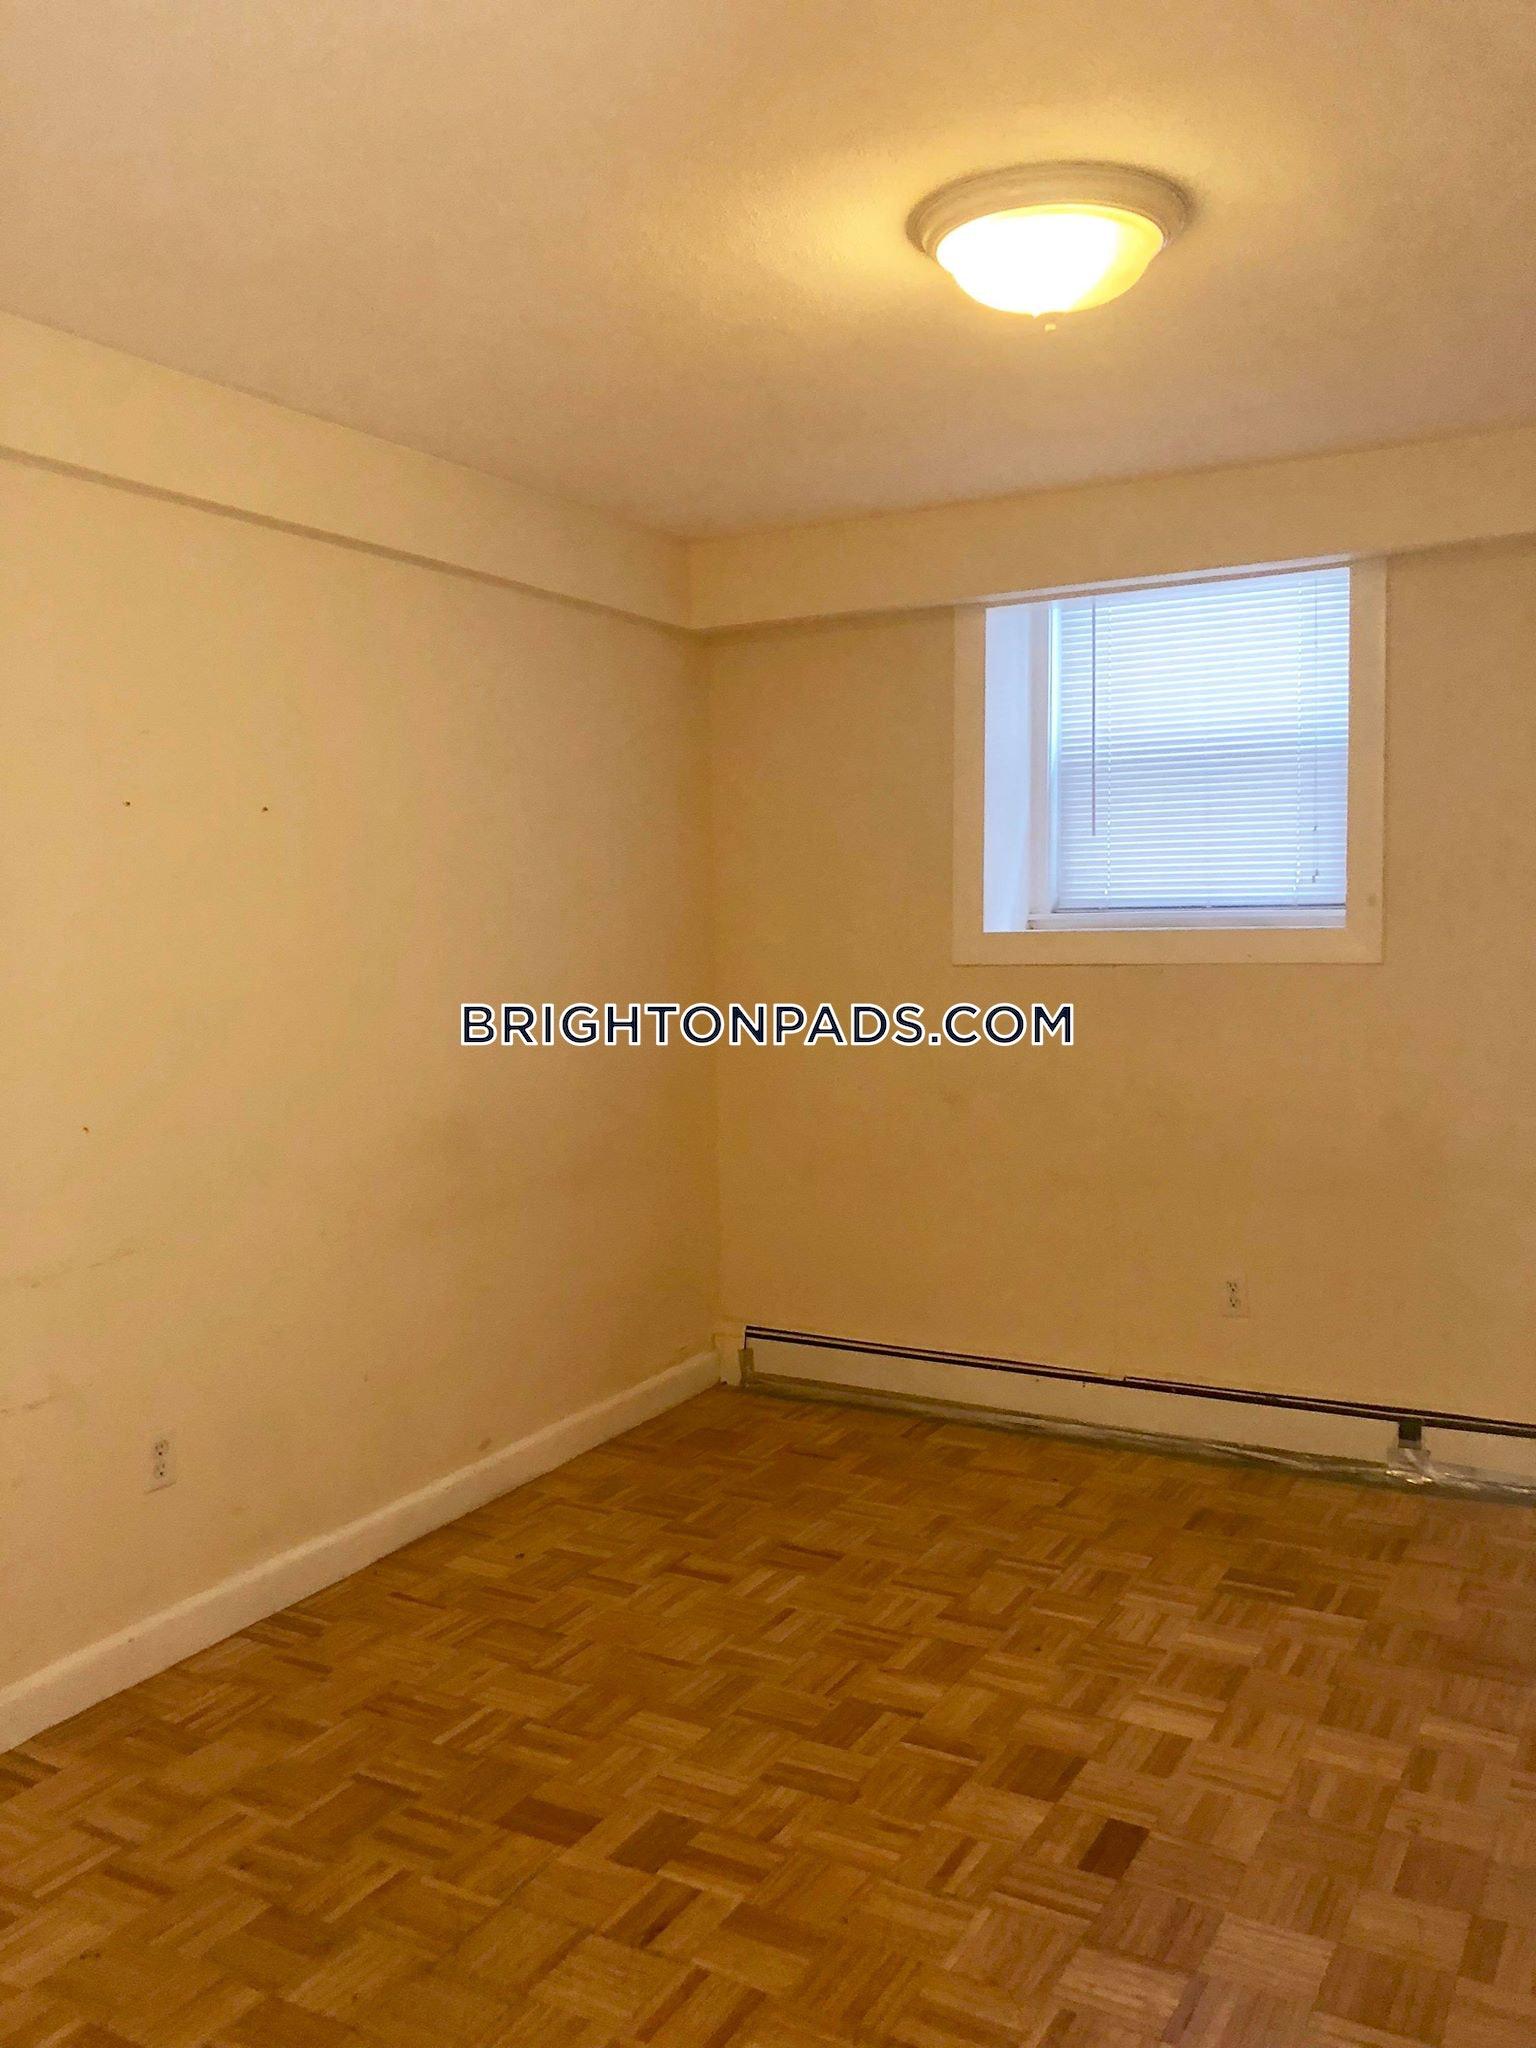 brighton-apartment-for-rent-3-bedrooms-1-bath-boston-2450-454986